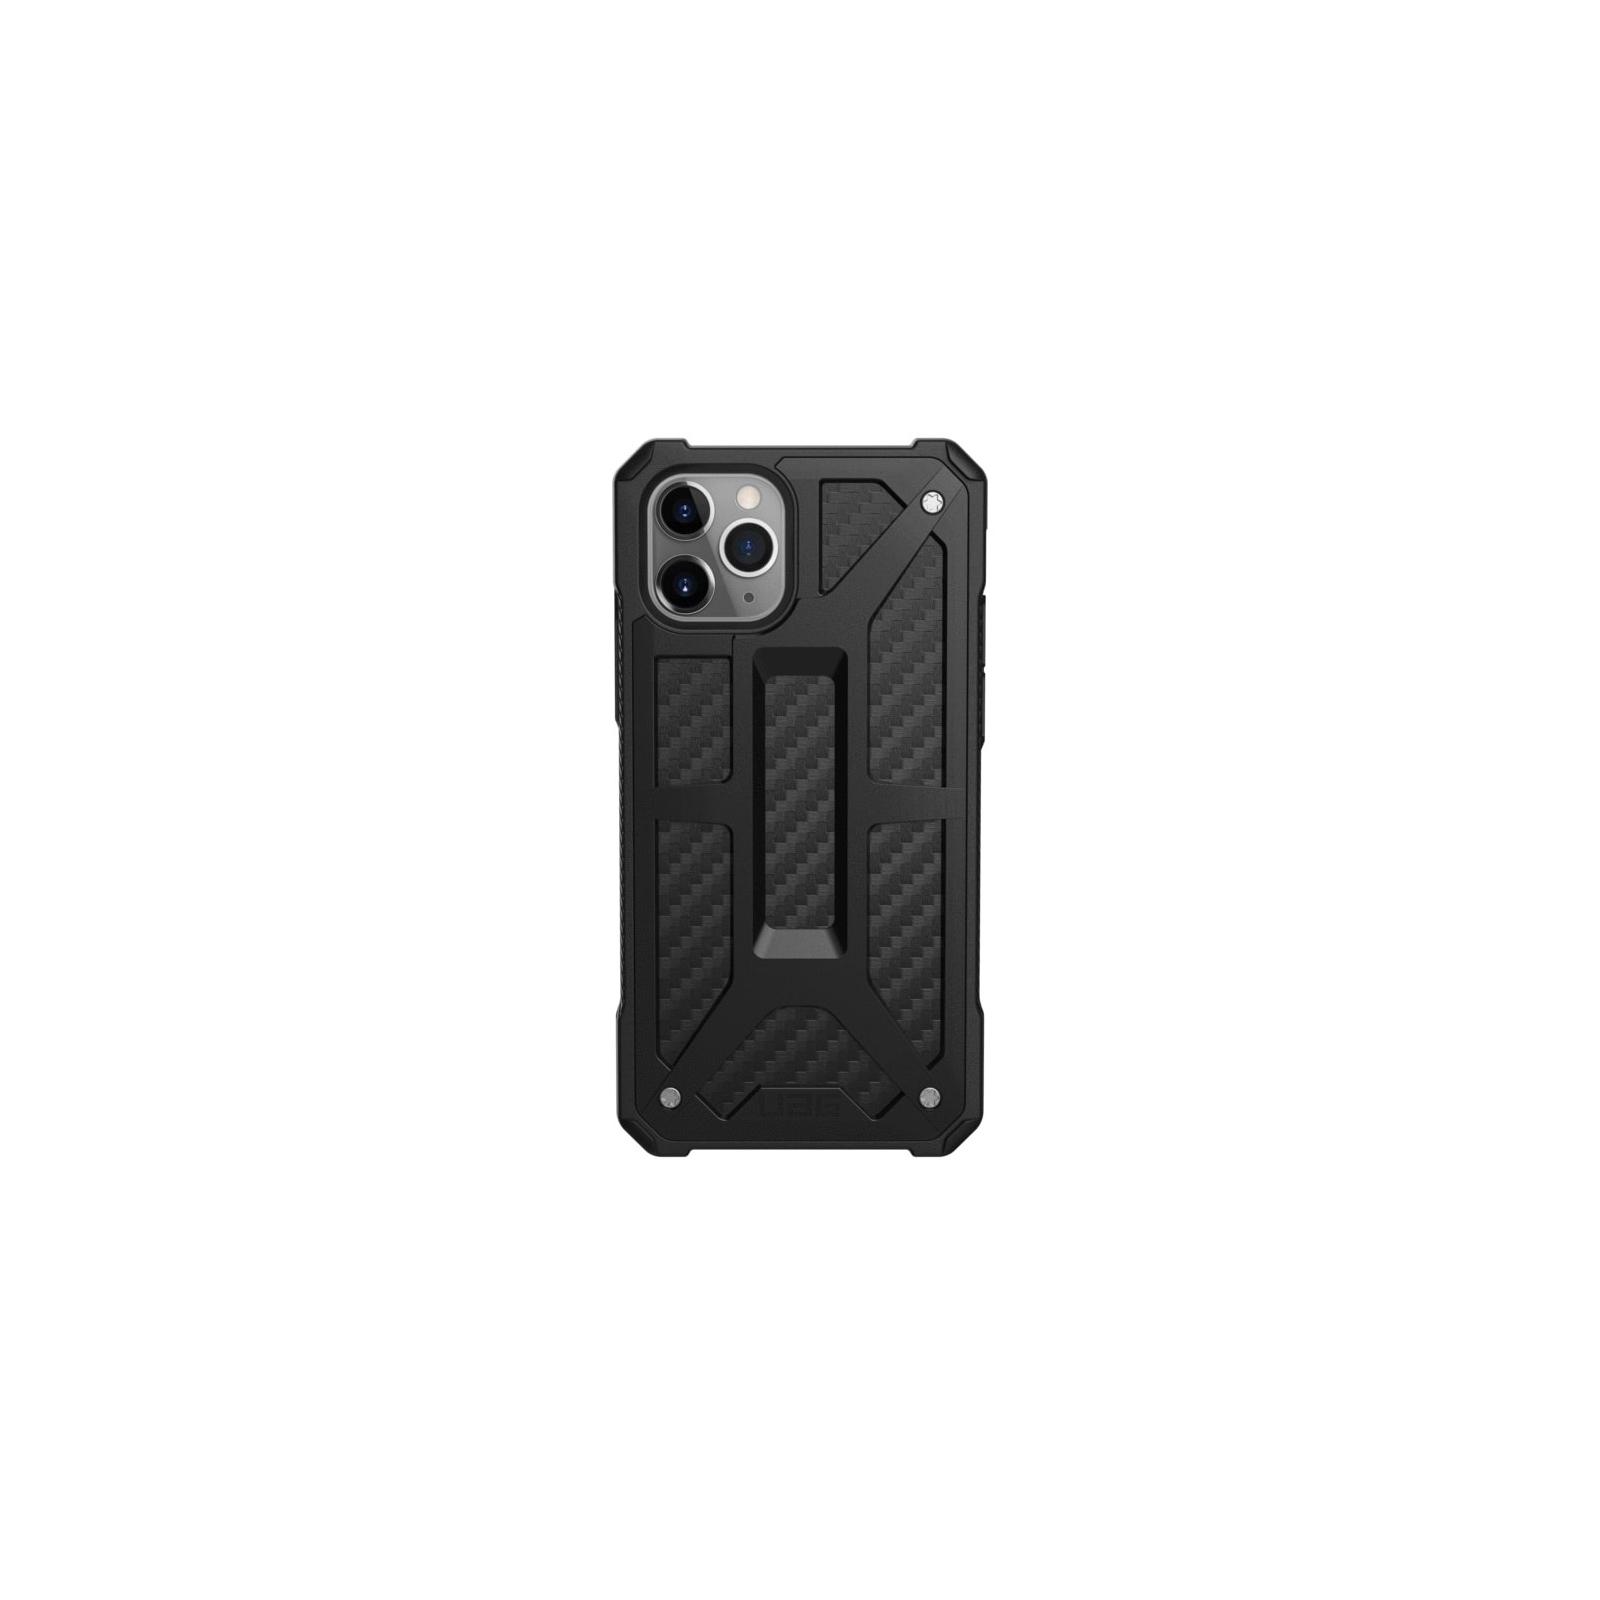 Чехол для моб. телефона Uag iPhone 11 Pro Monarch, Carbon Fiber (111701114242)